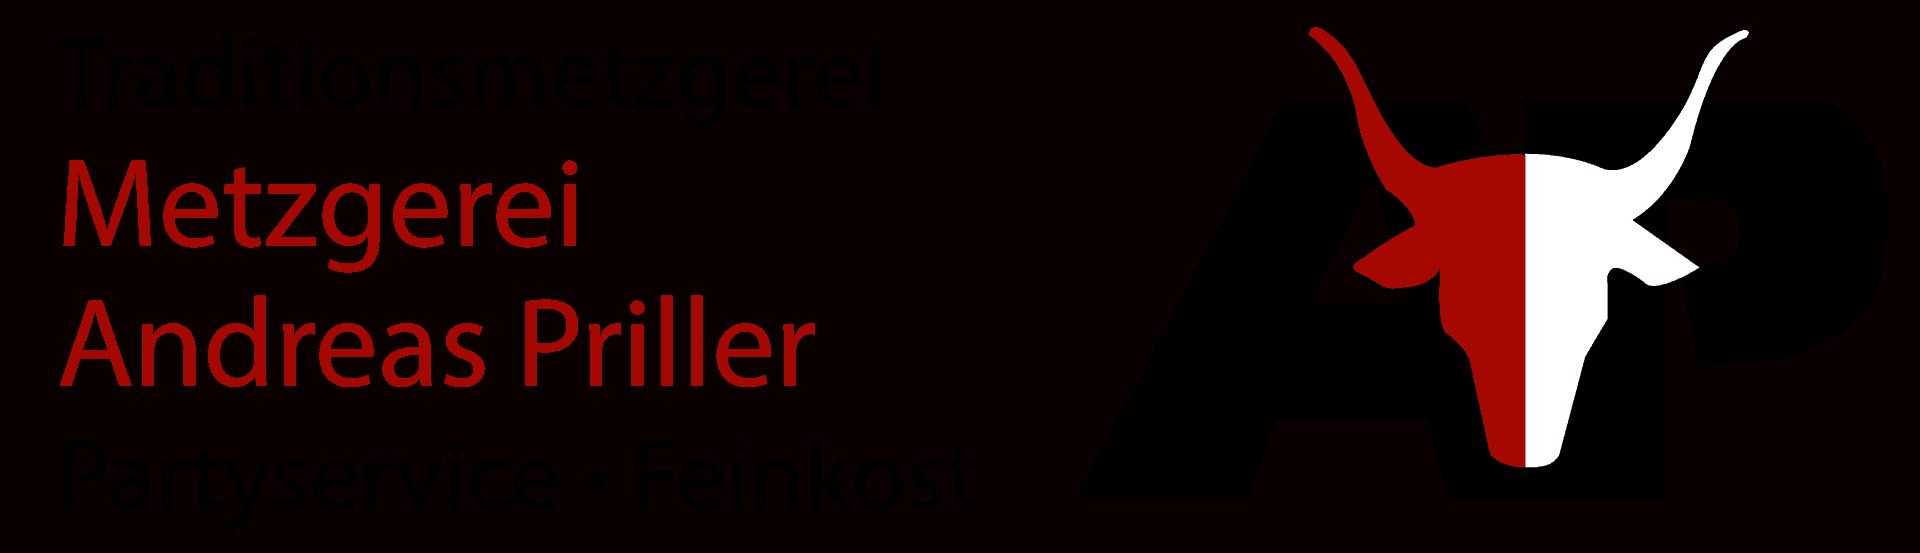 Metzgerei Andreas Priller - Grünwald